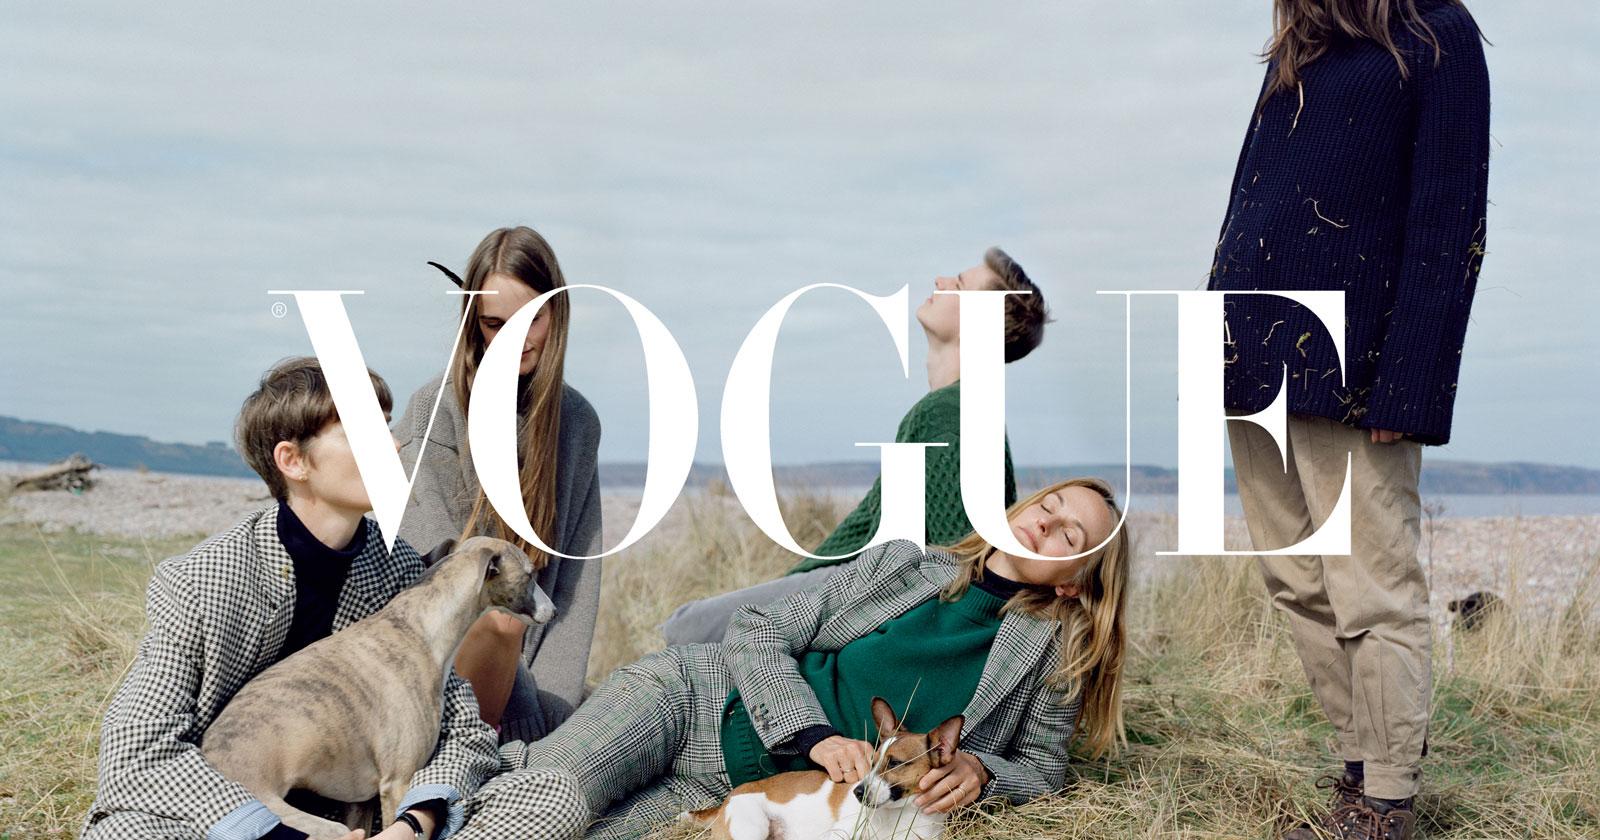 Spring/summer 2021 Resort   British Vogue Regarding Uri Spring 2021 2020 Calendar